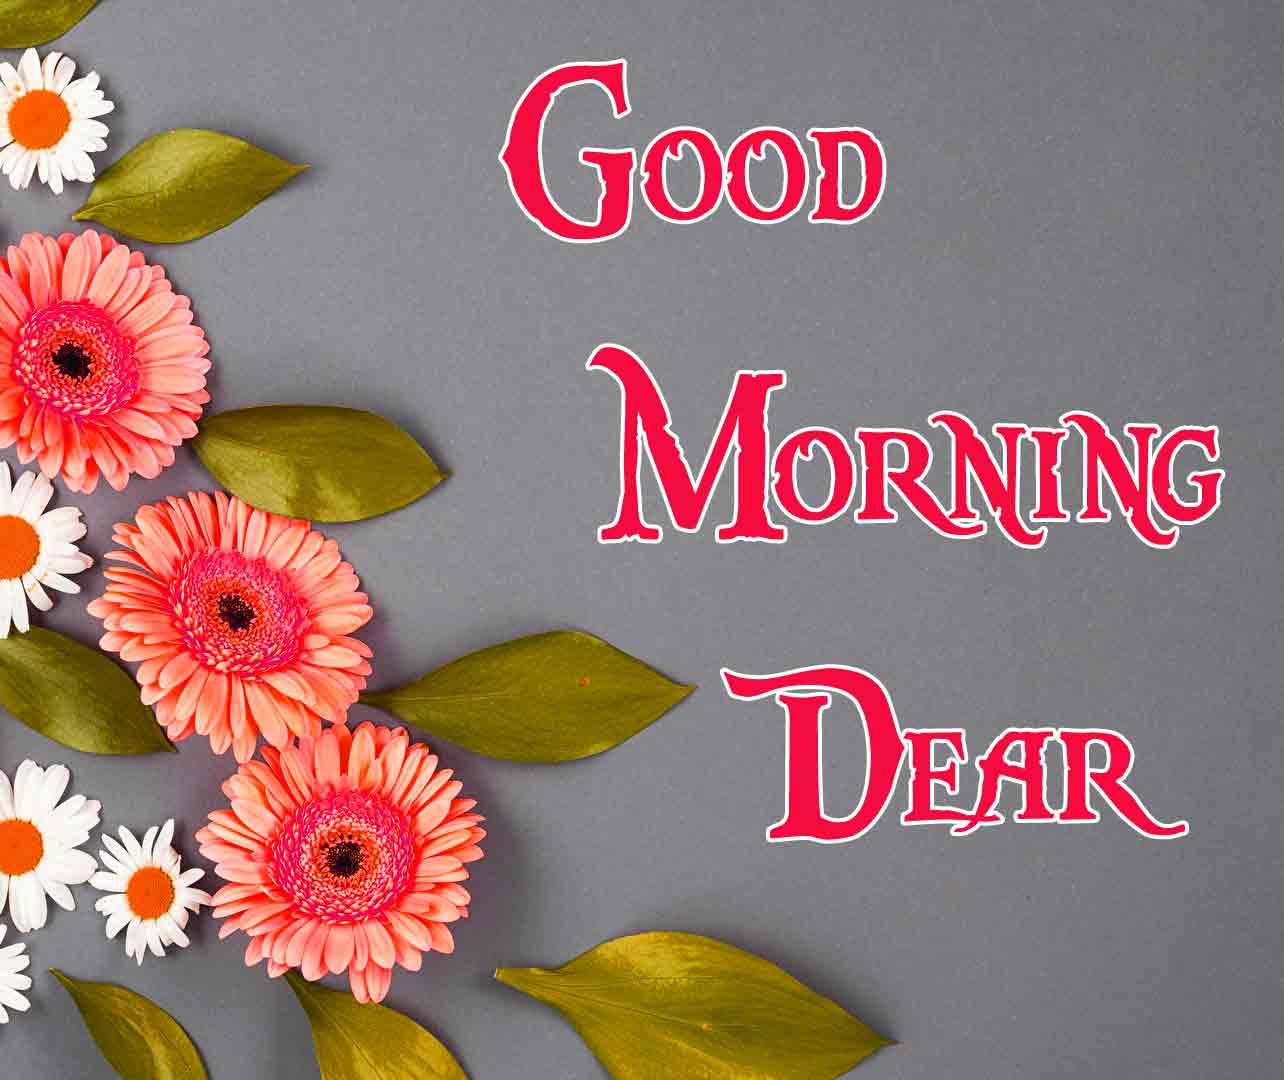 Good Morning Darling Images 42